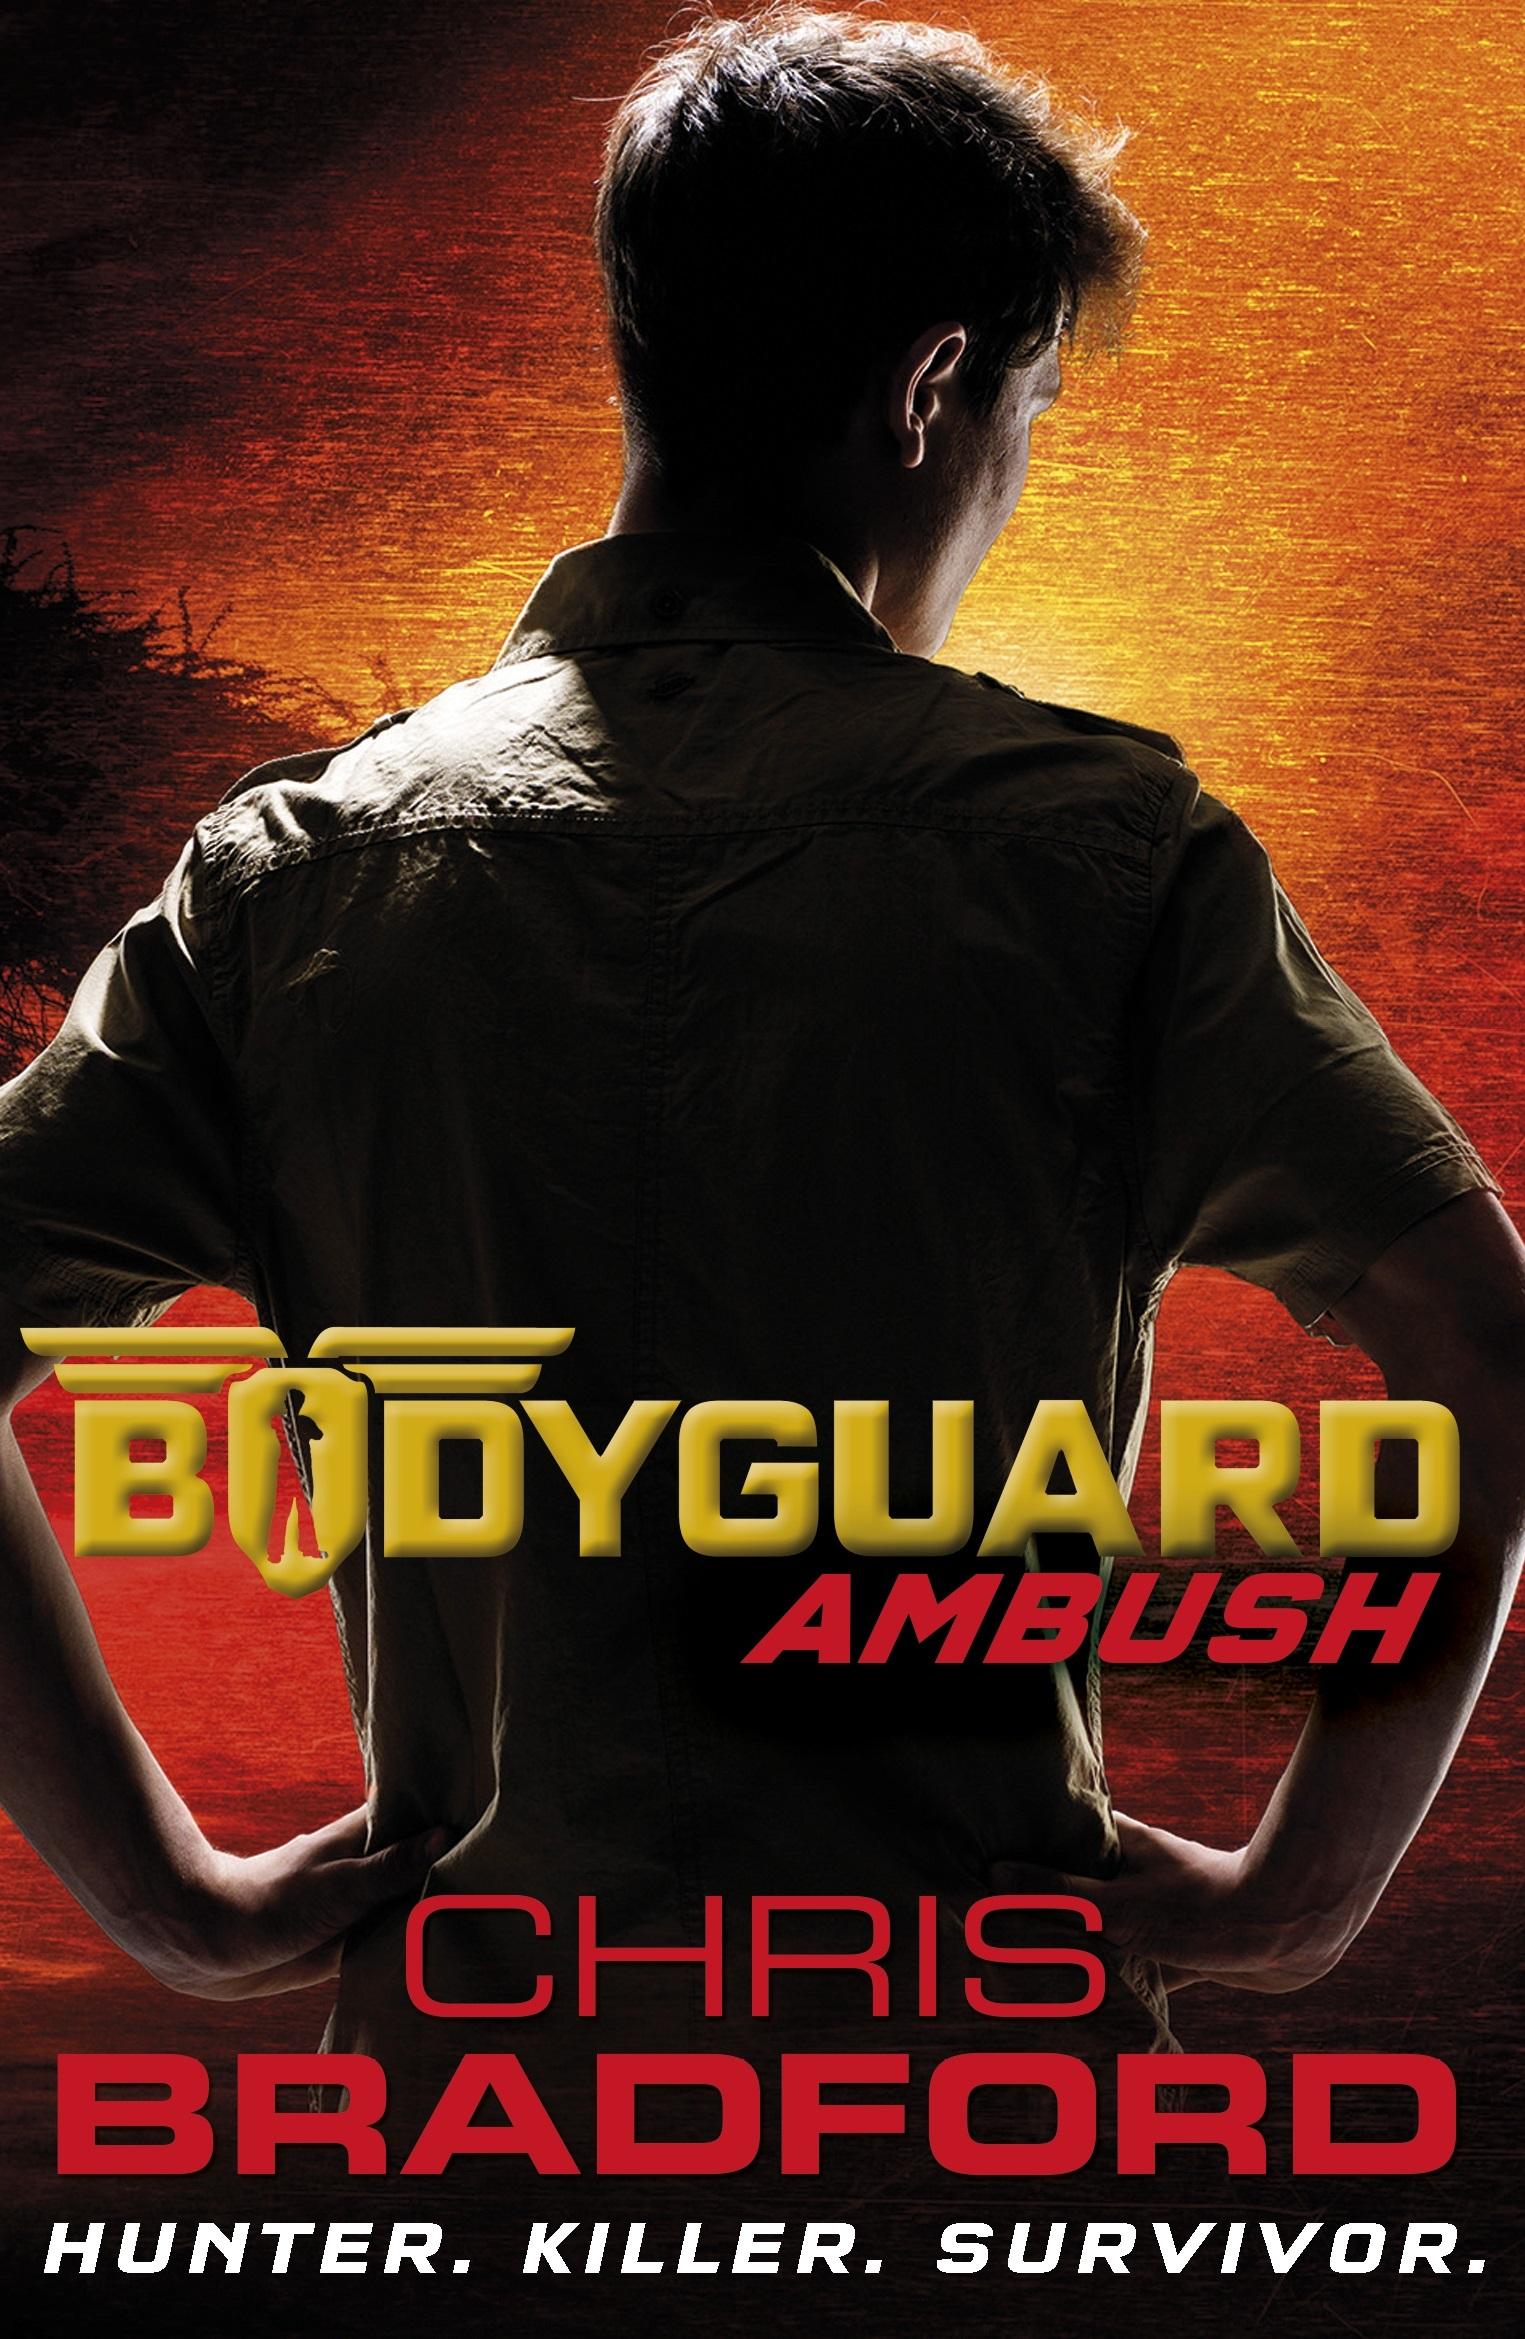 bodyguard ransom chris bradford pdf